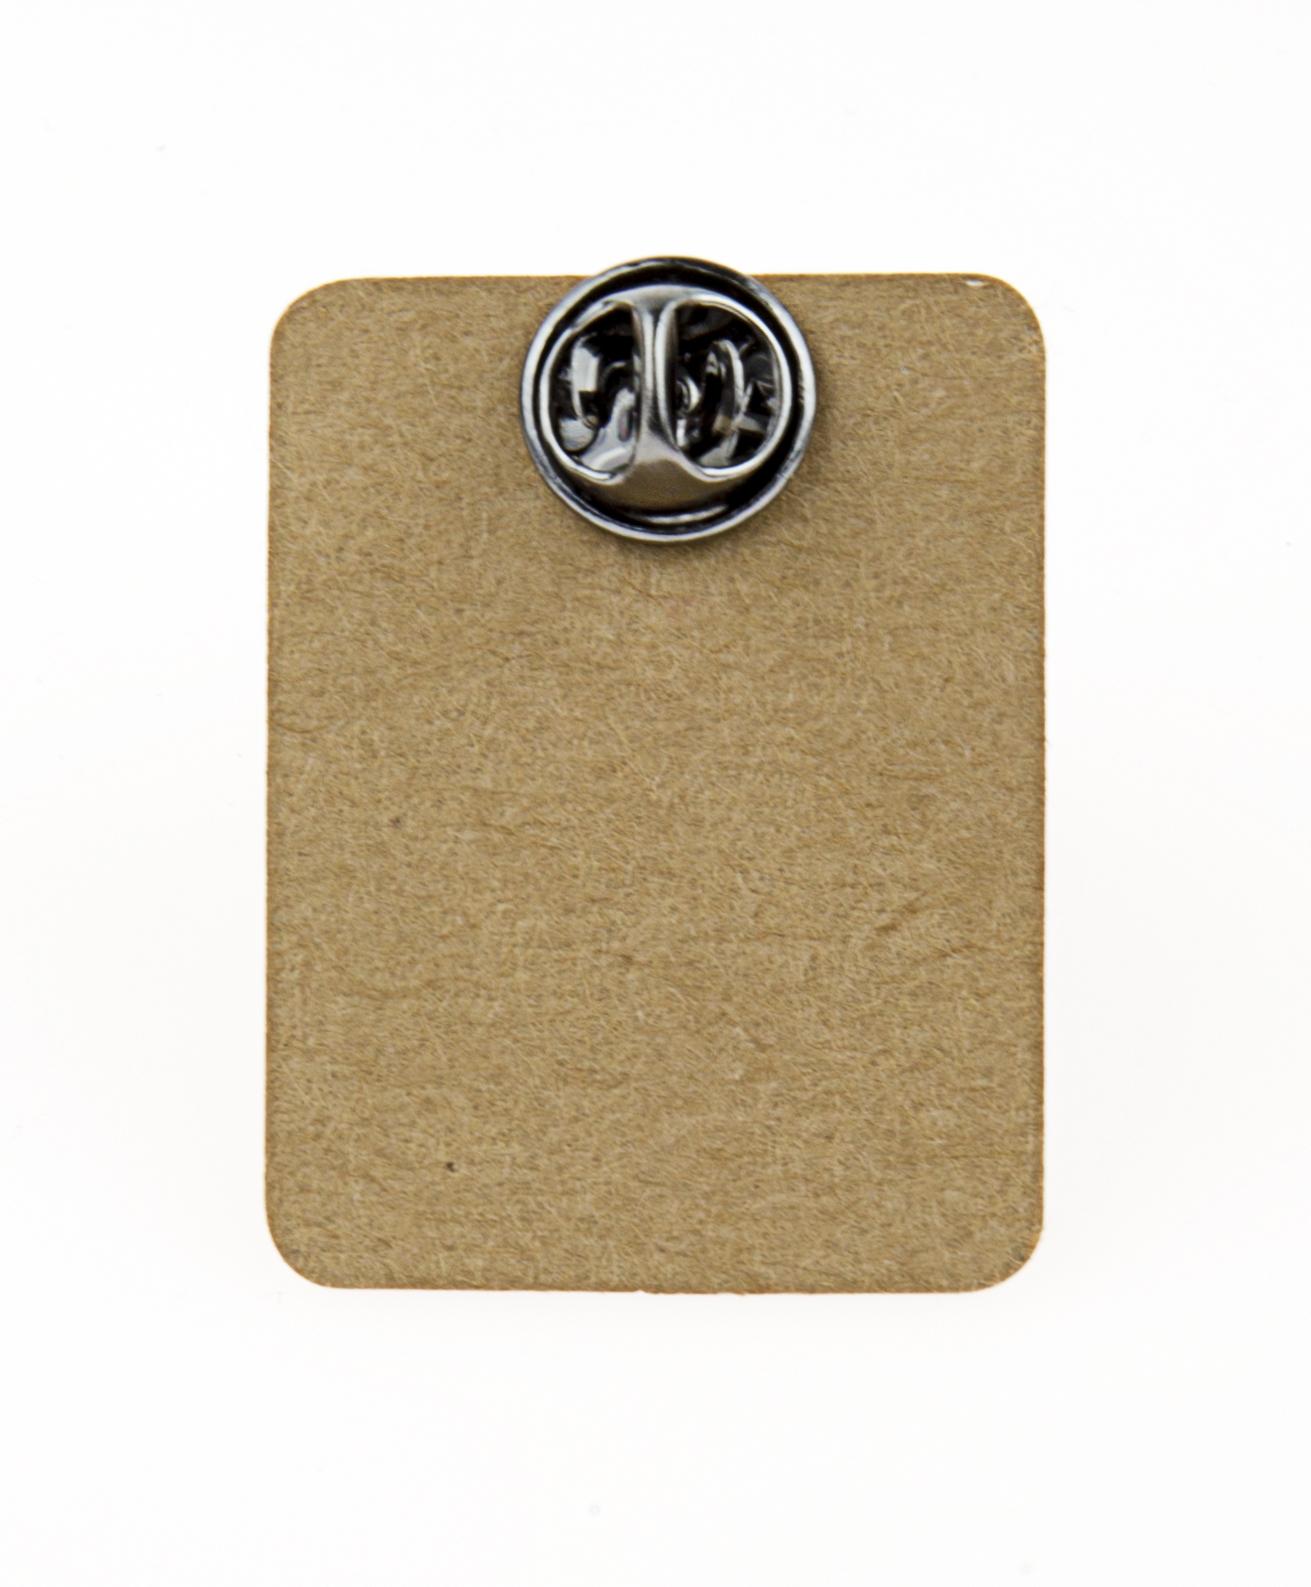 Metal Sunglass Sea View Enamel Pin Badge